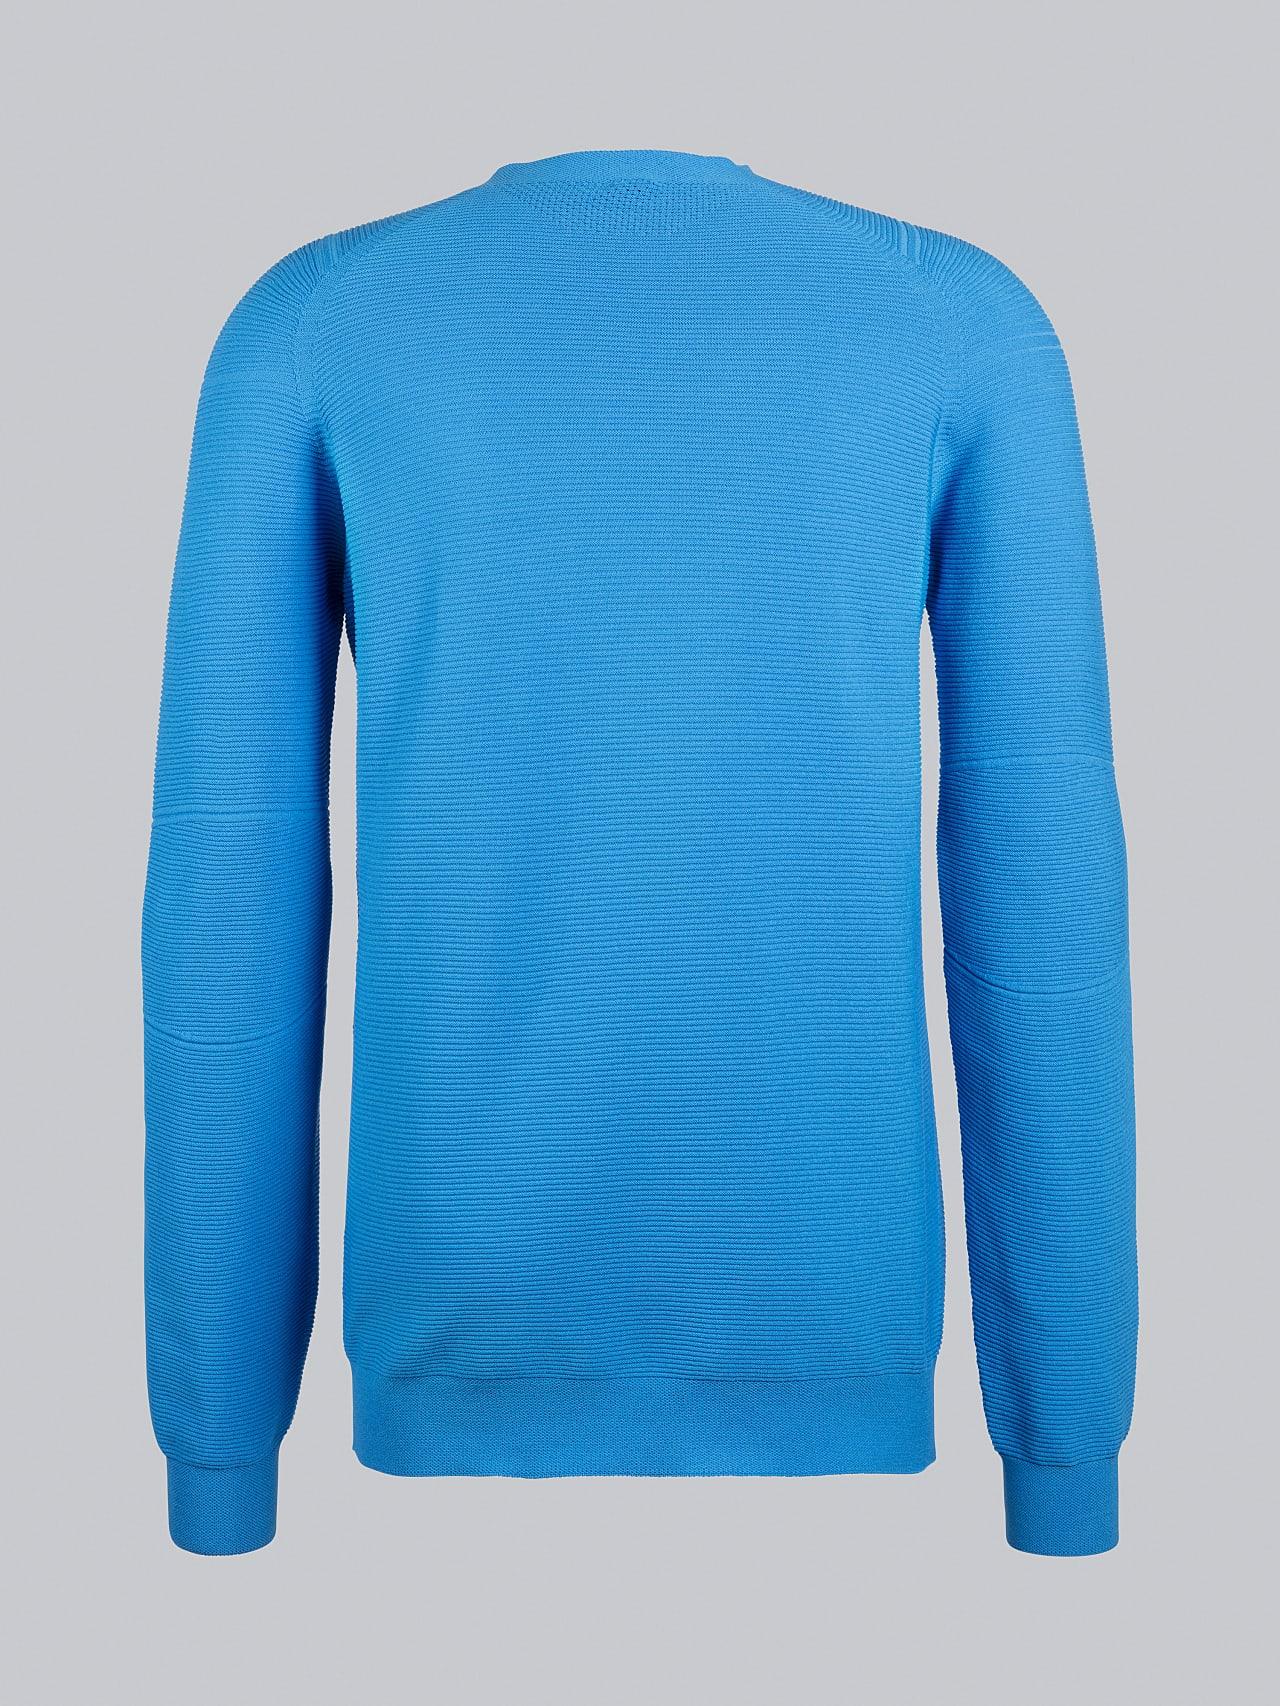 FOSOP V3.Y5.02 Seamless 3D Knit Crewneck Jumper blue Left Alpha Tauri